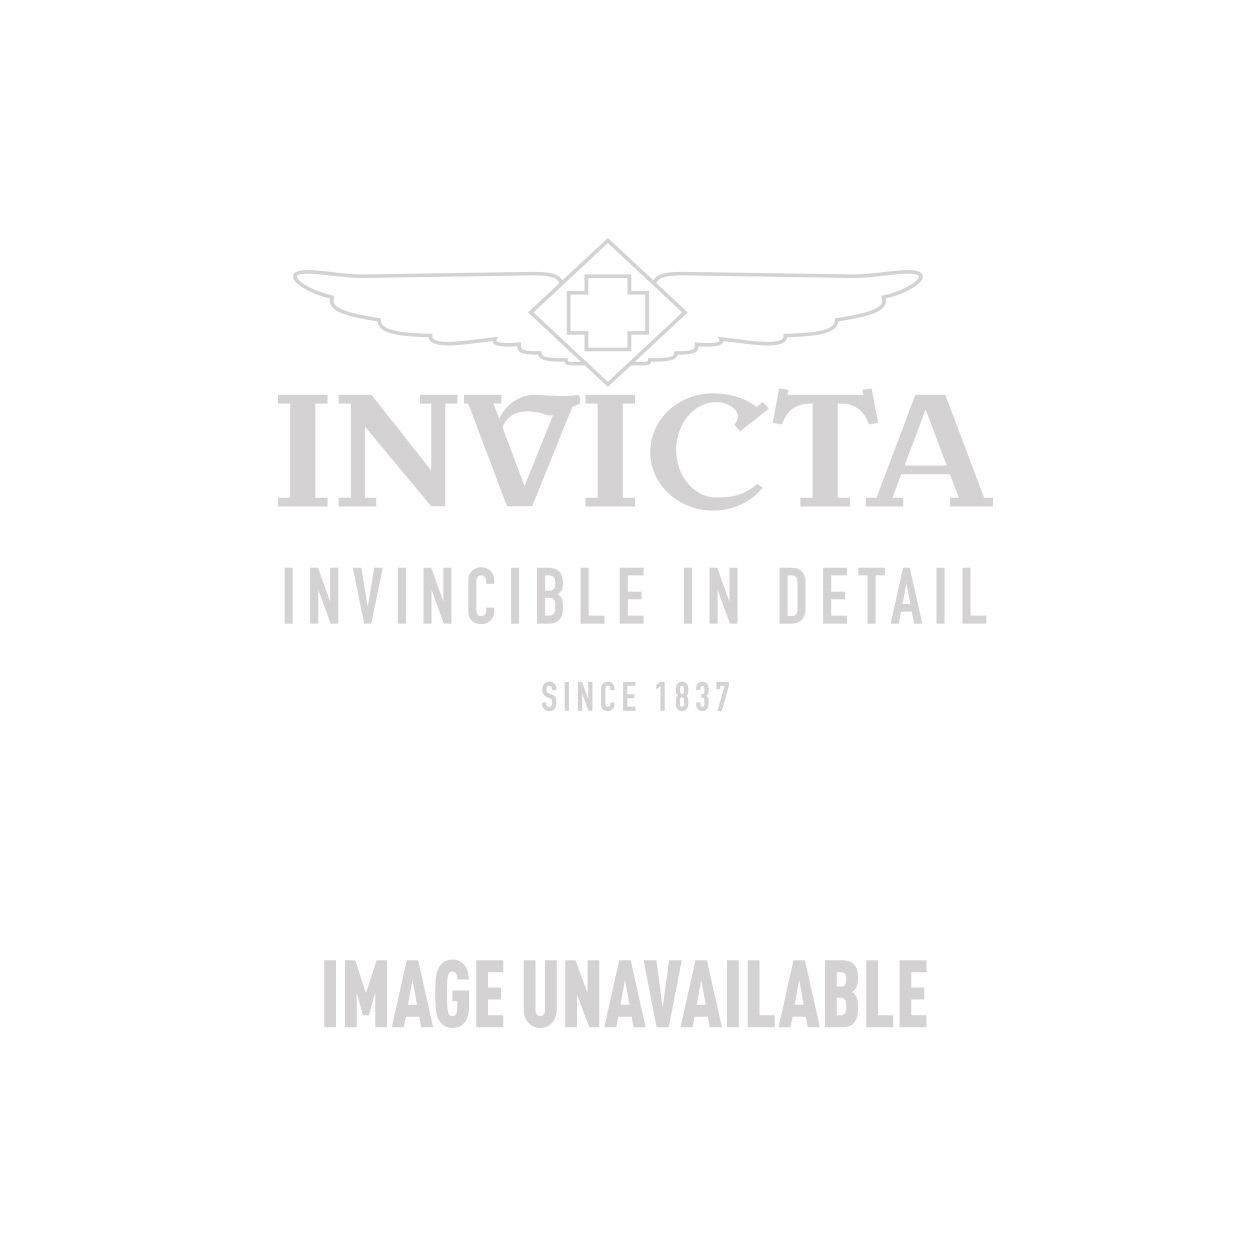 Invicta Corduba Quartz Watch - Gunmetal case with Orange tone Leather band - Model 18994